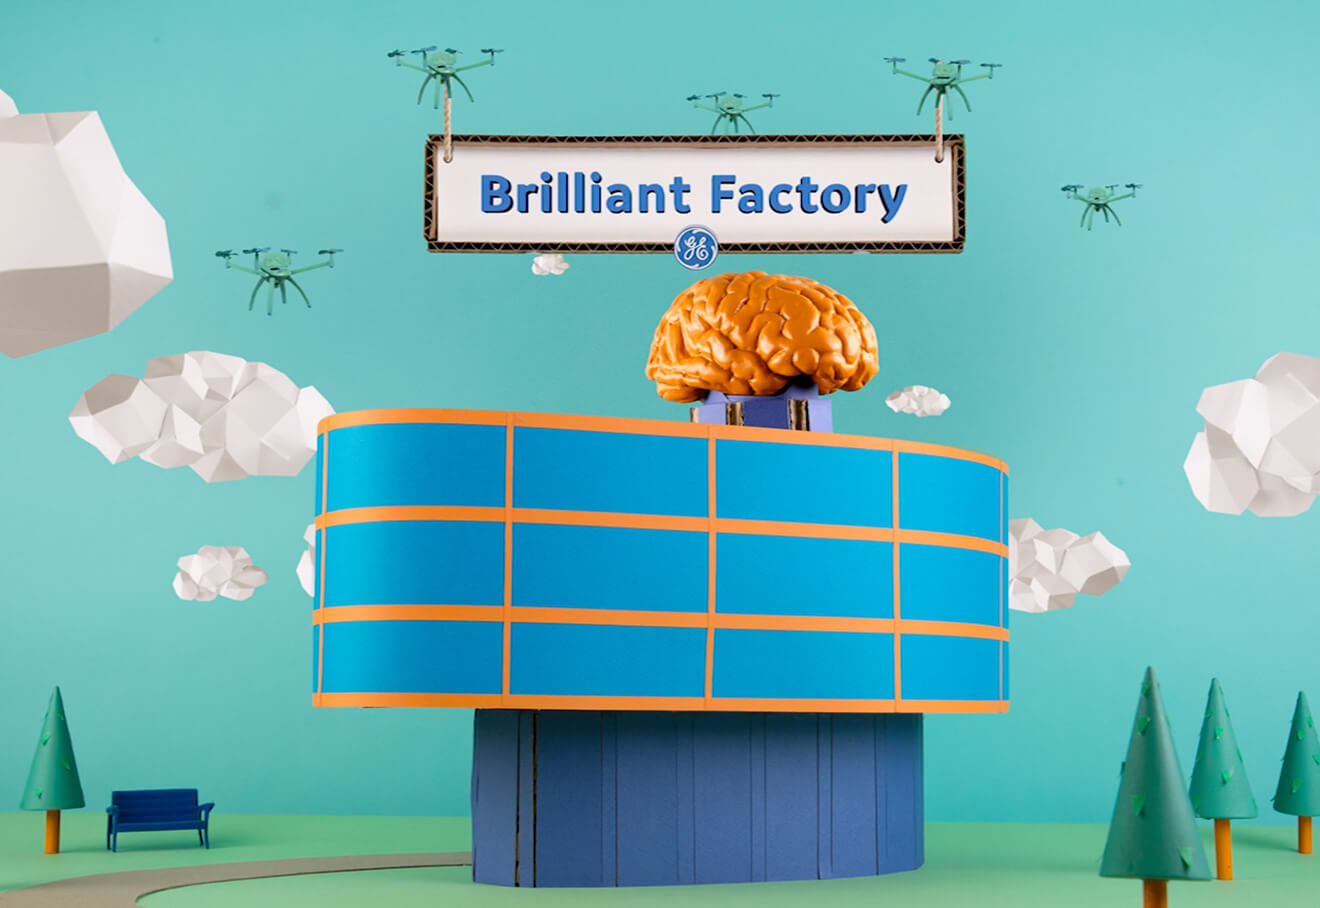 The Brilliant Factory